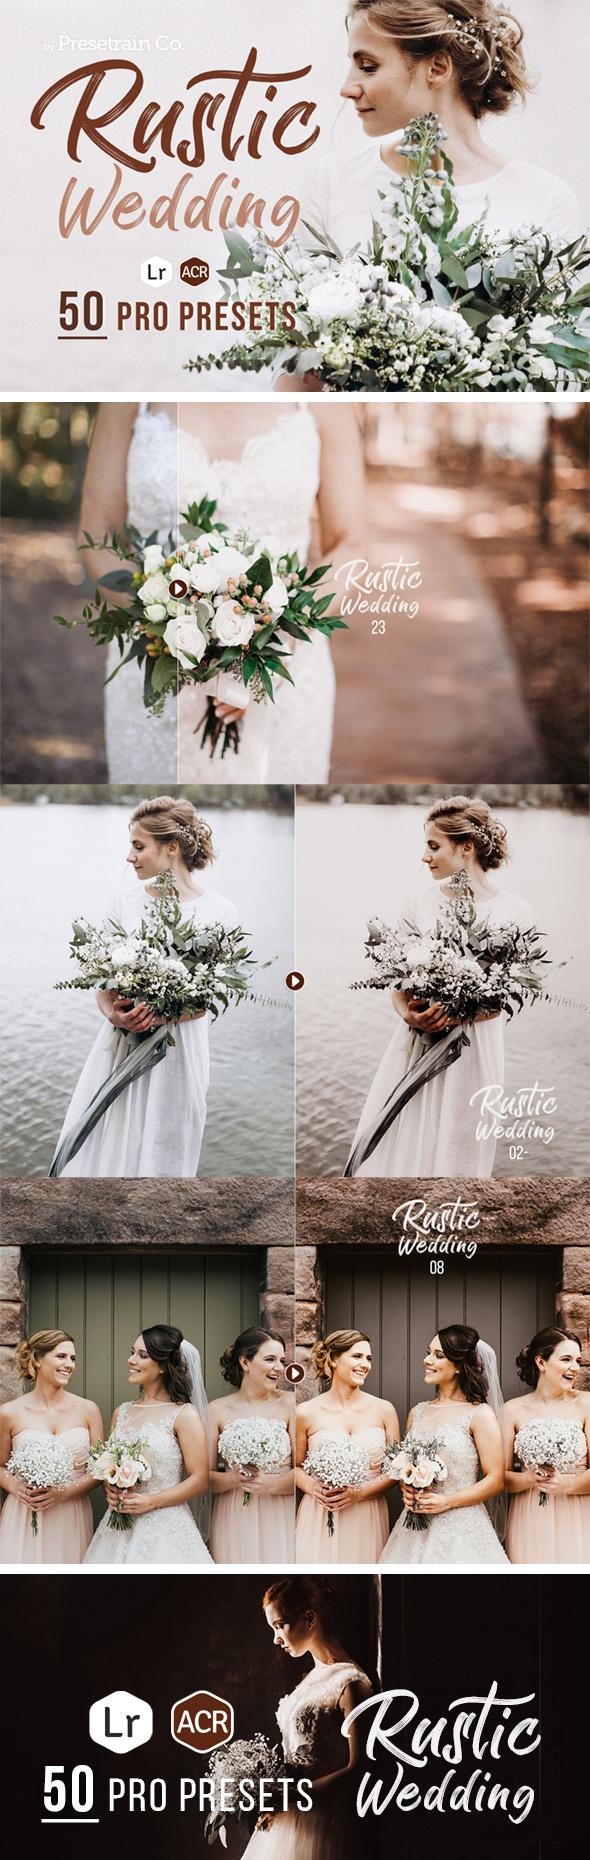 50 Rustic Wedding Presets for Lightroom & ACR - Wedding Lightroom Presets